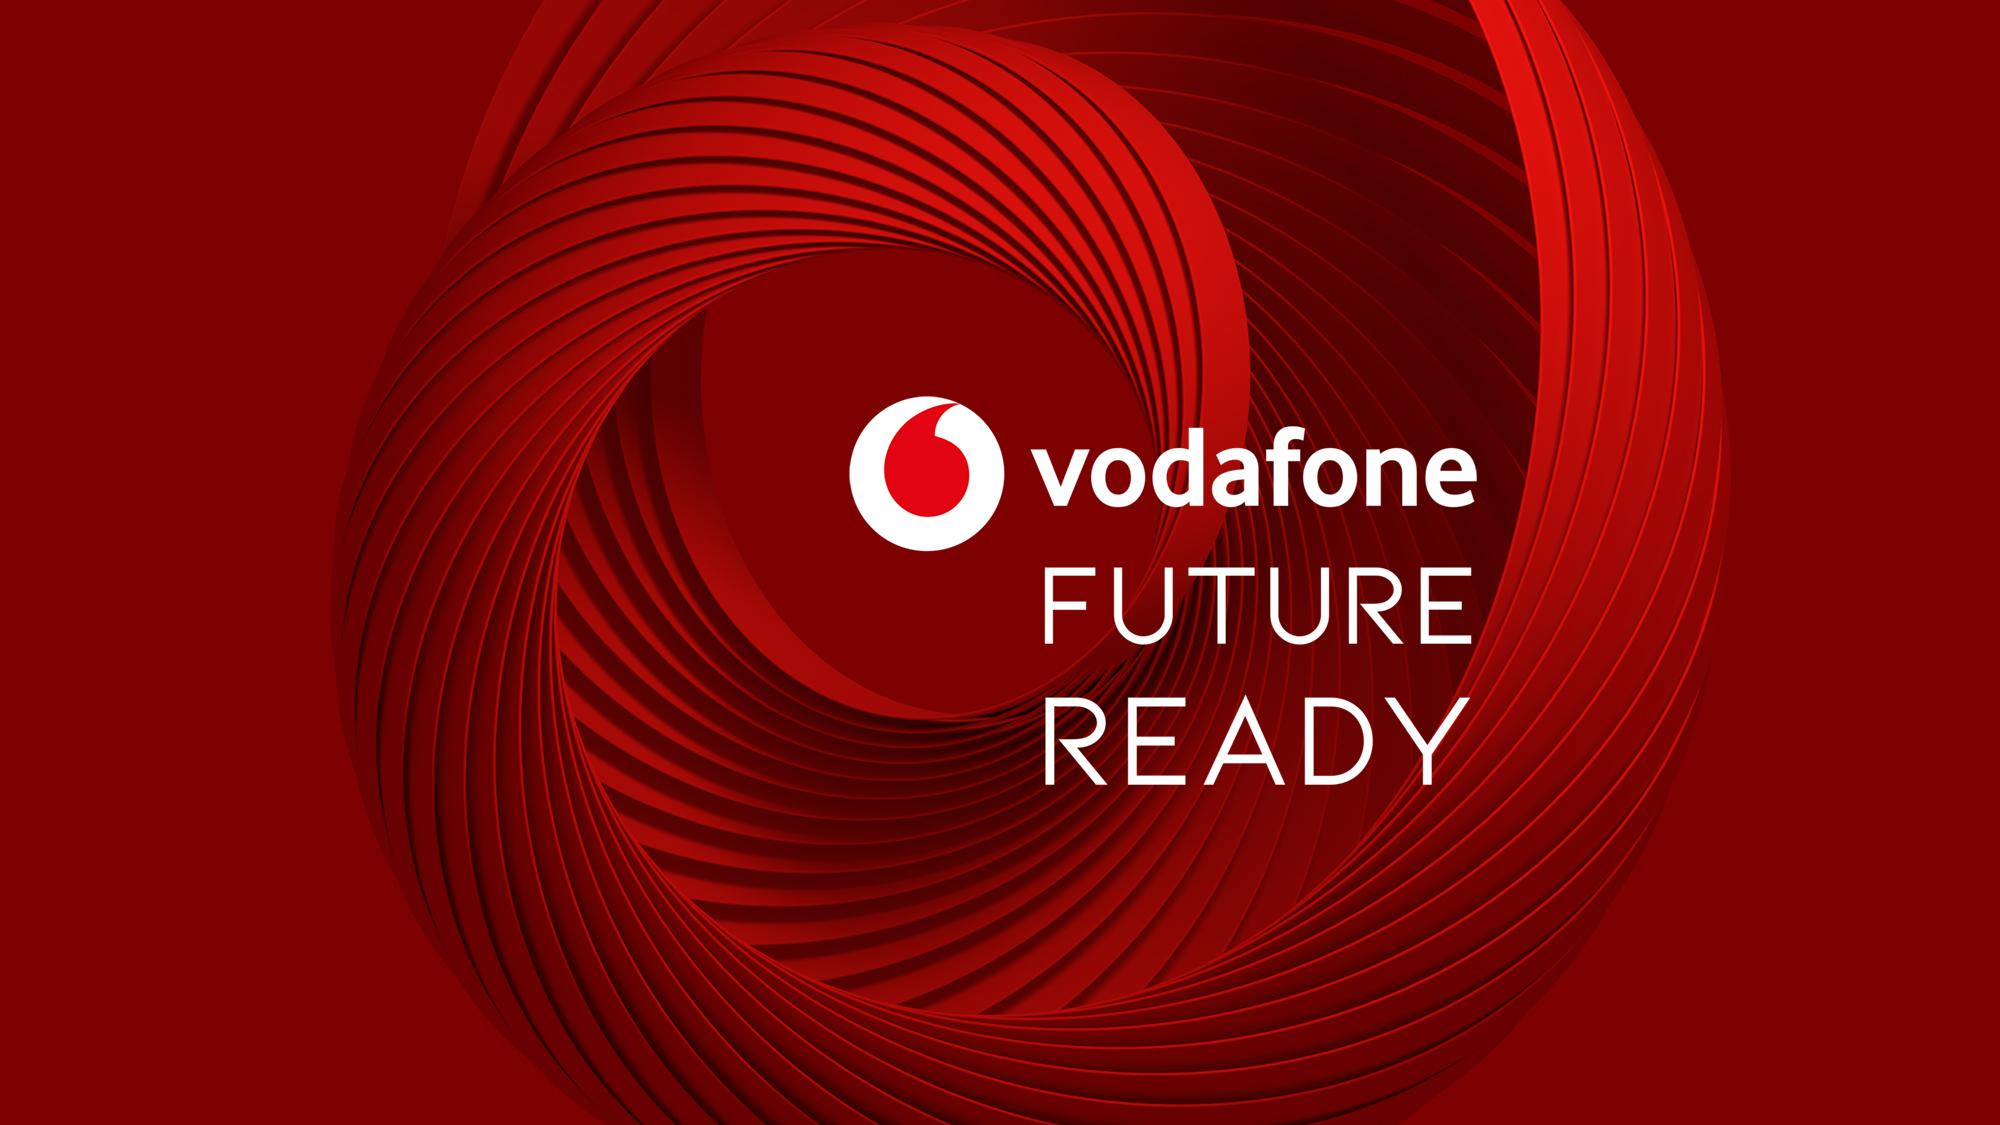 Future Ready 2018 - Vodafone UK News Centre